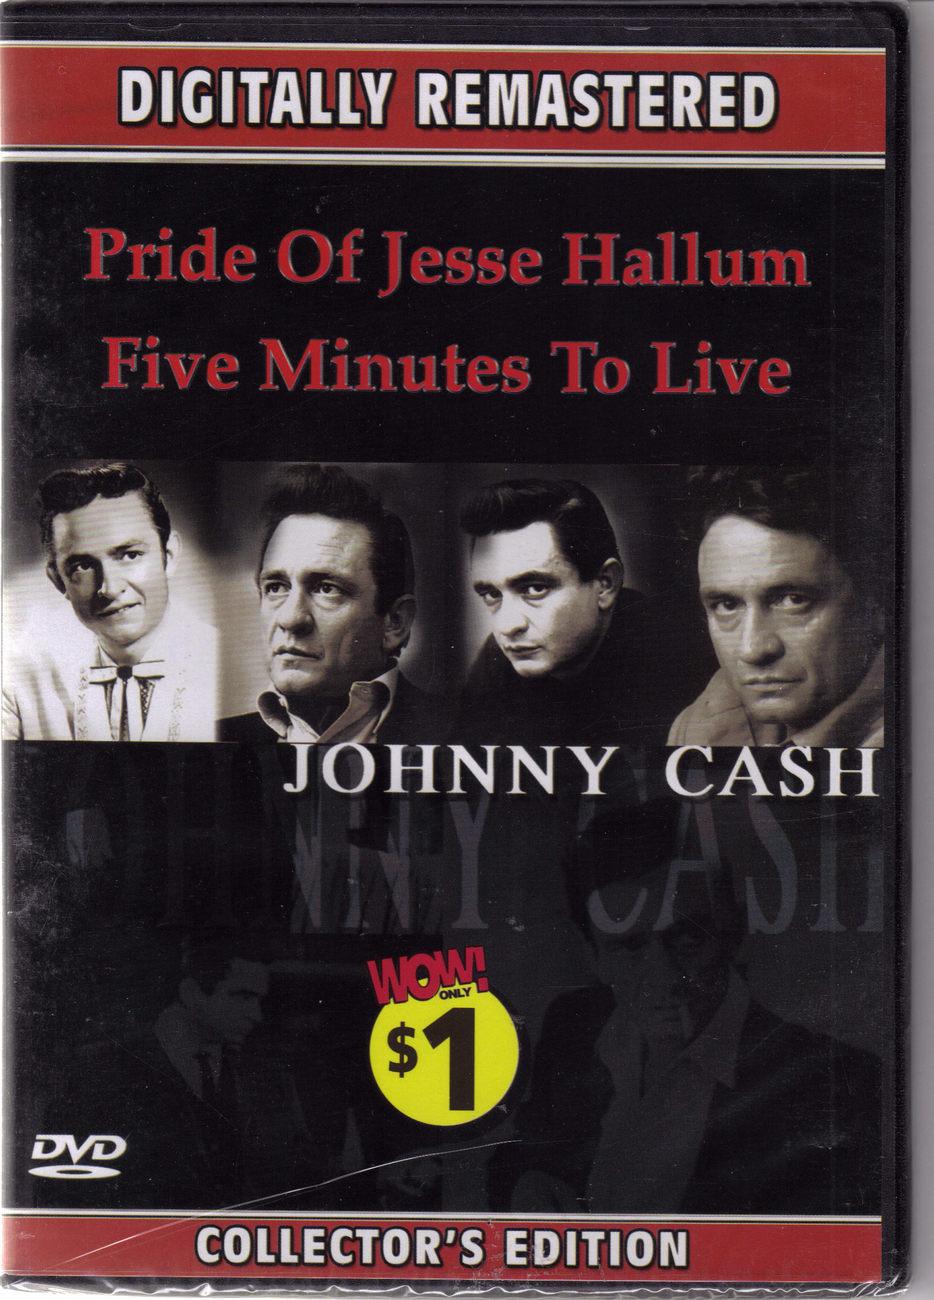 Dvd johnny cash